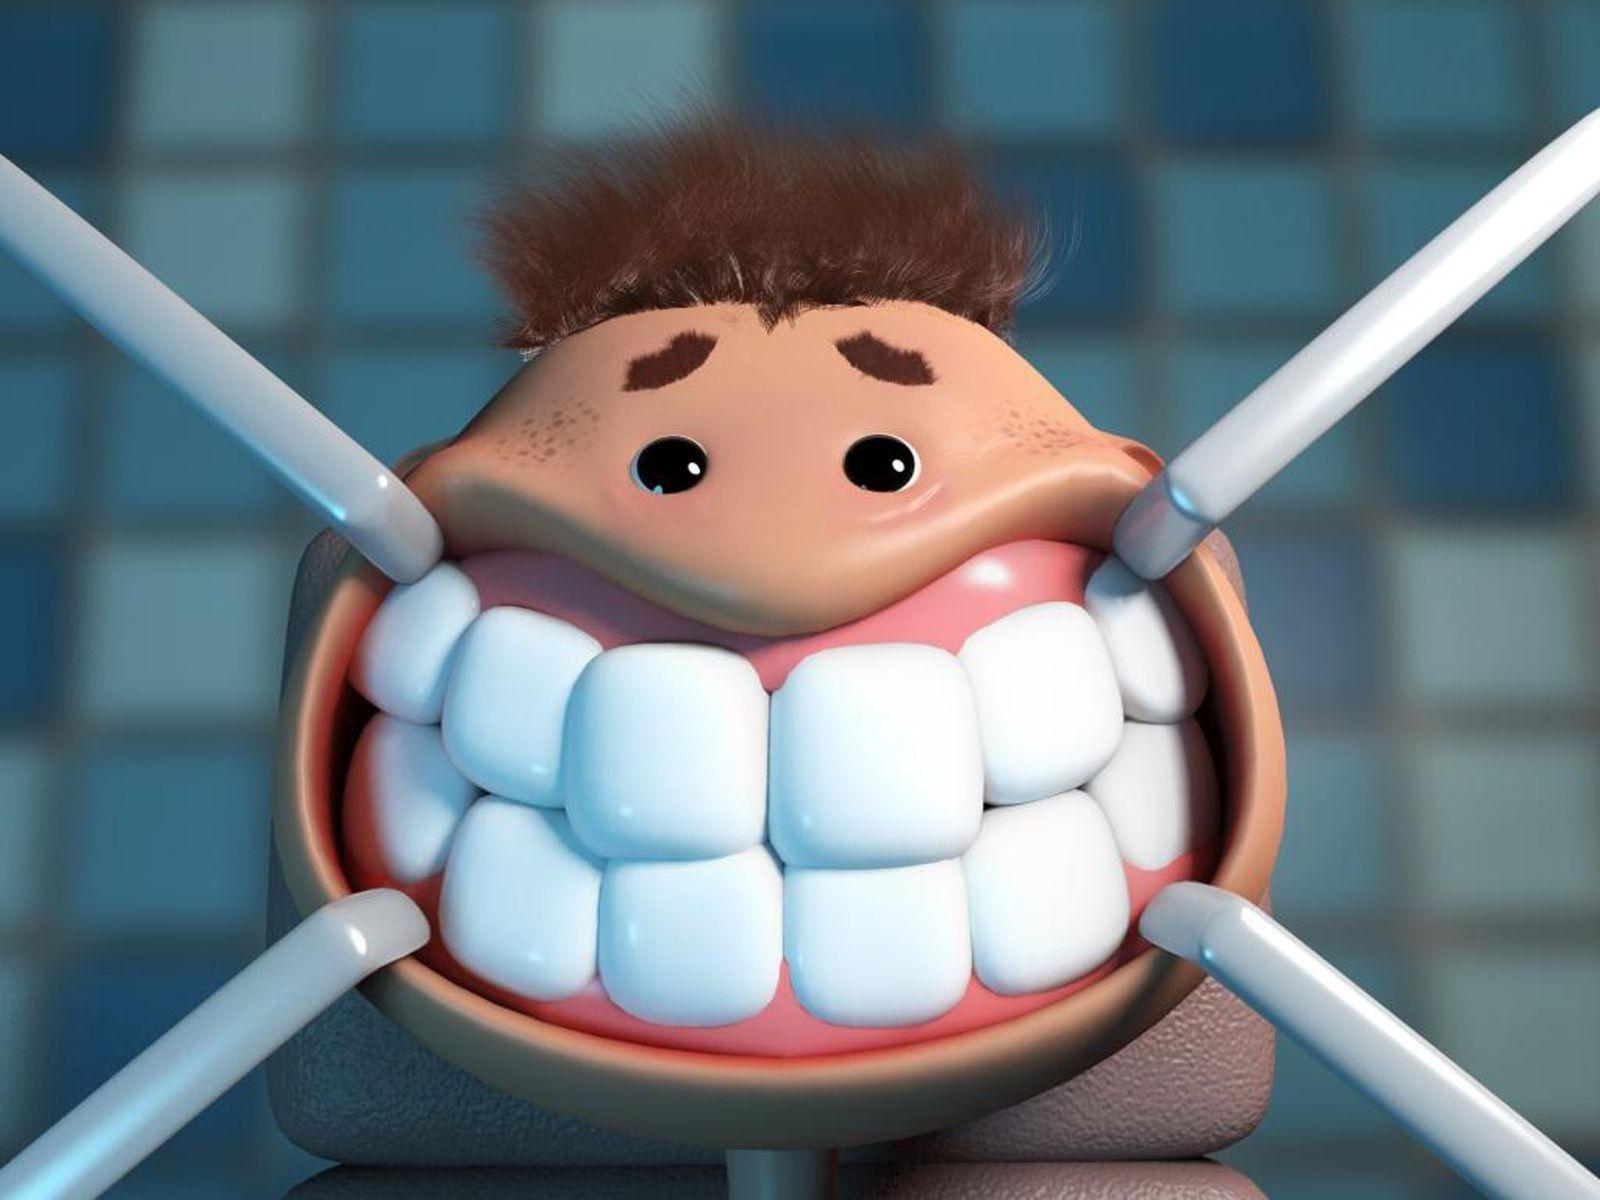 Рисунок февраля, картинка про зубы приколы